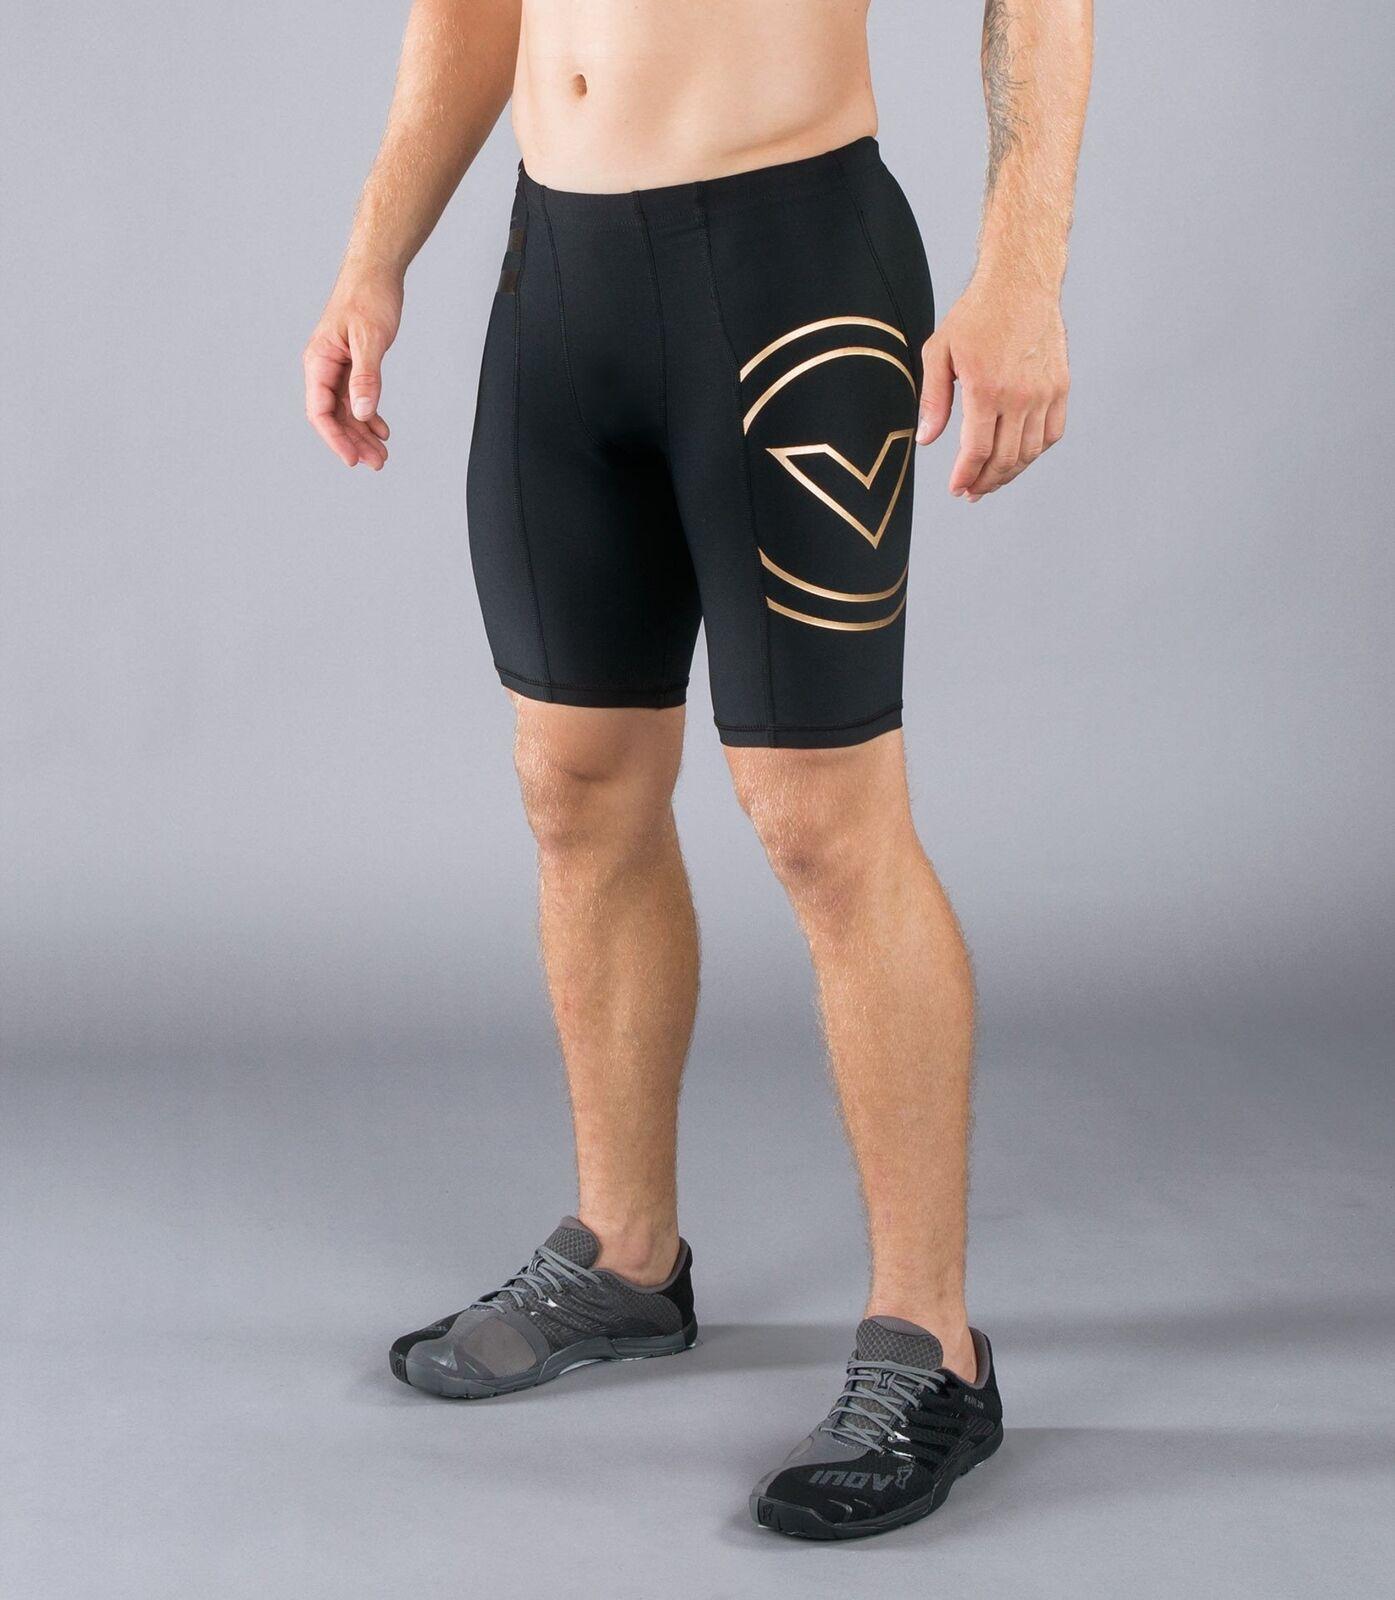 Virus Herren Au11 Bioceramic V2 Tech Shorts - - - Schwarz Gold 64dc20